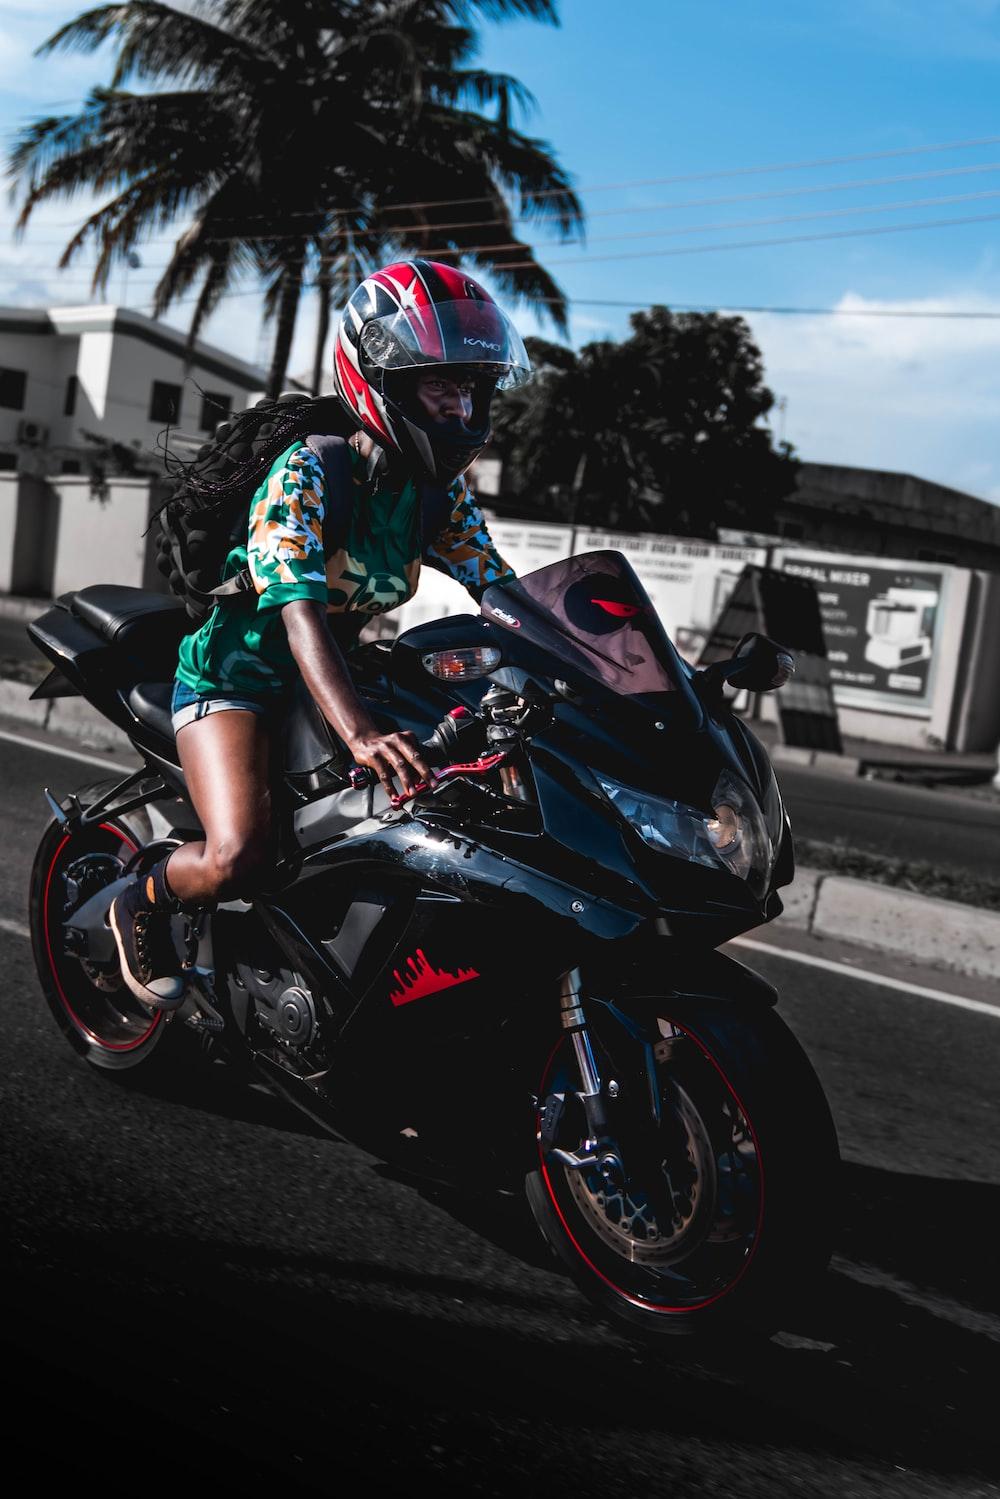 woman wearing green shirt riding on sports bike